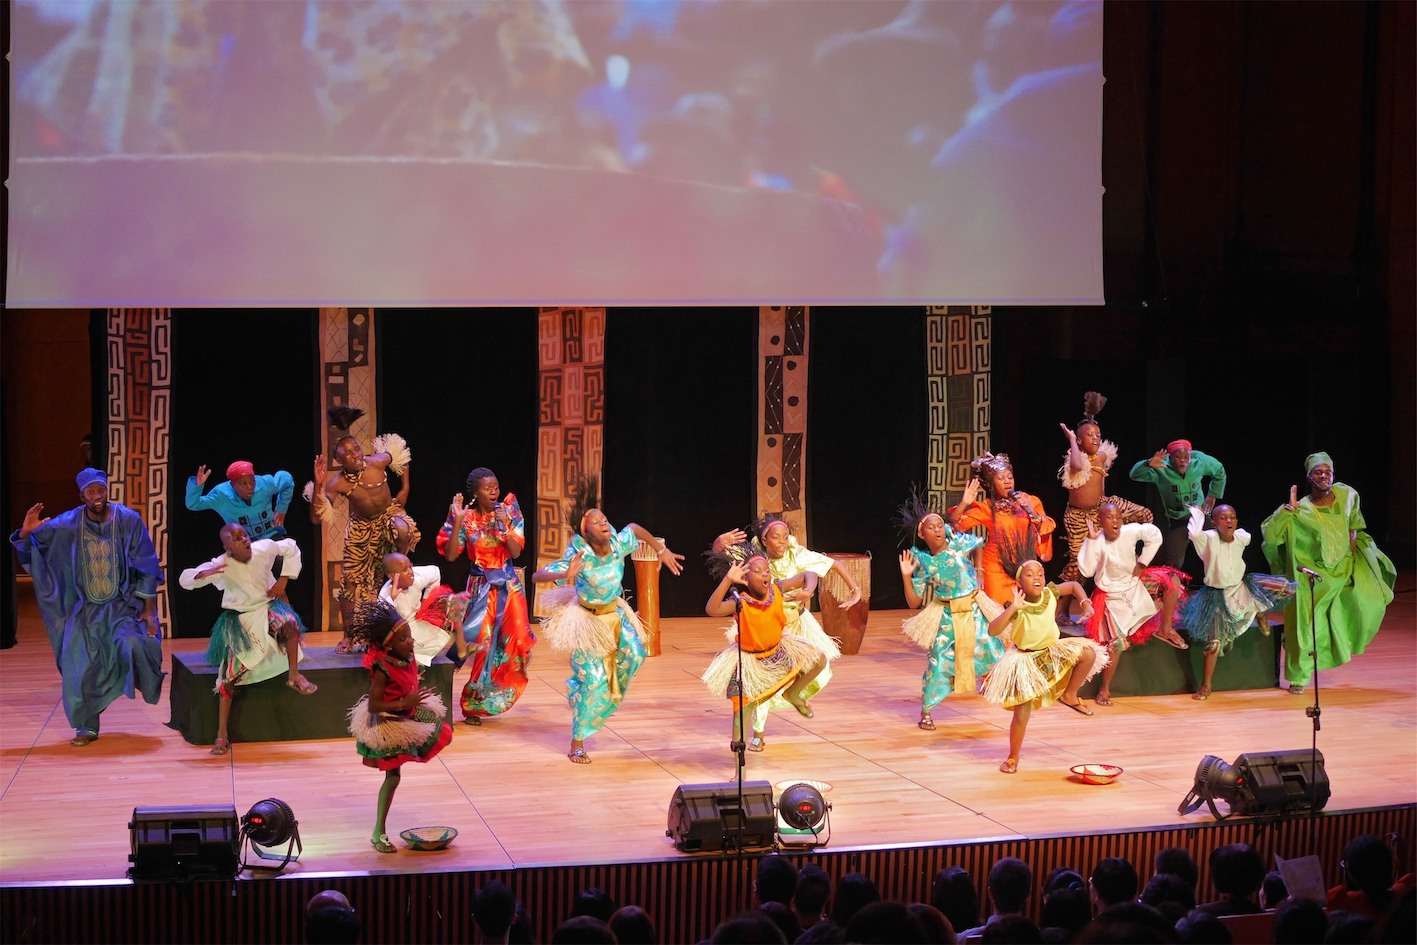 Beautiful Africa: A New Generation – Watoto Children's Choir